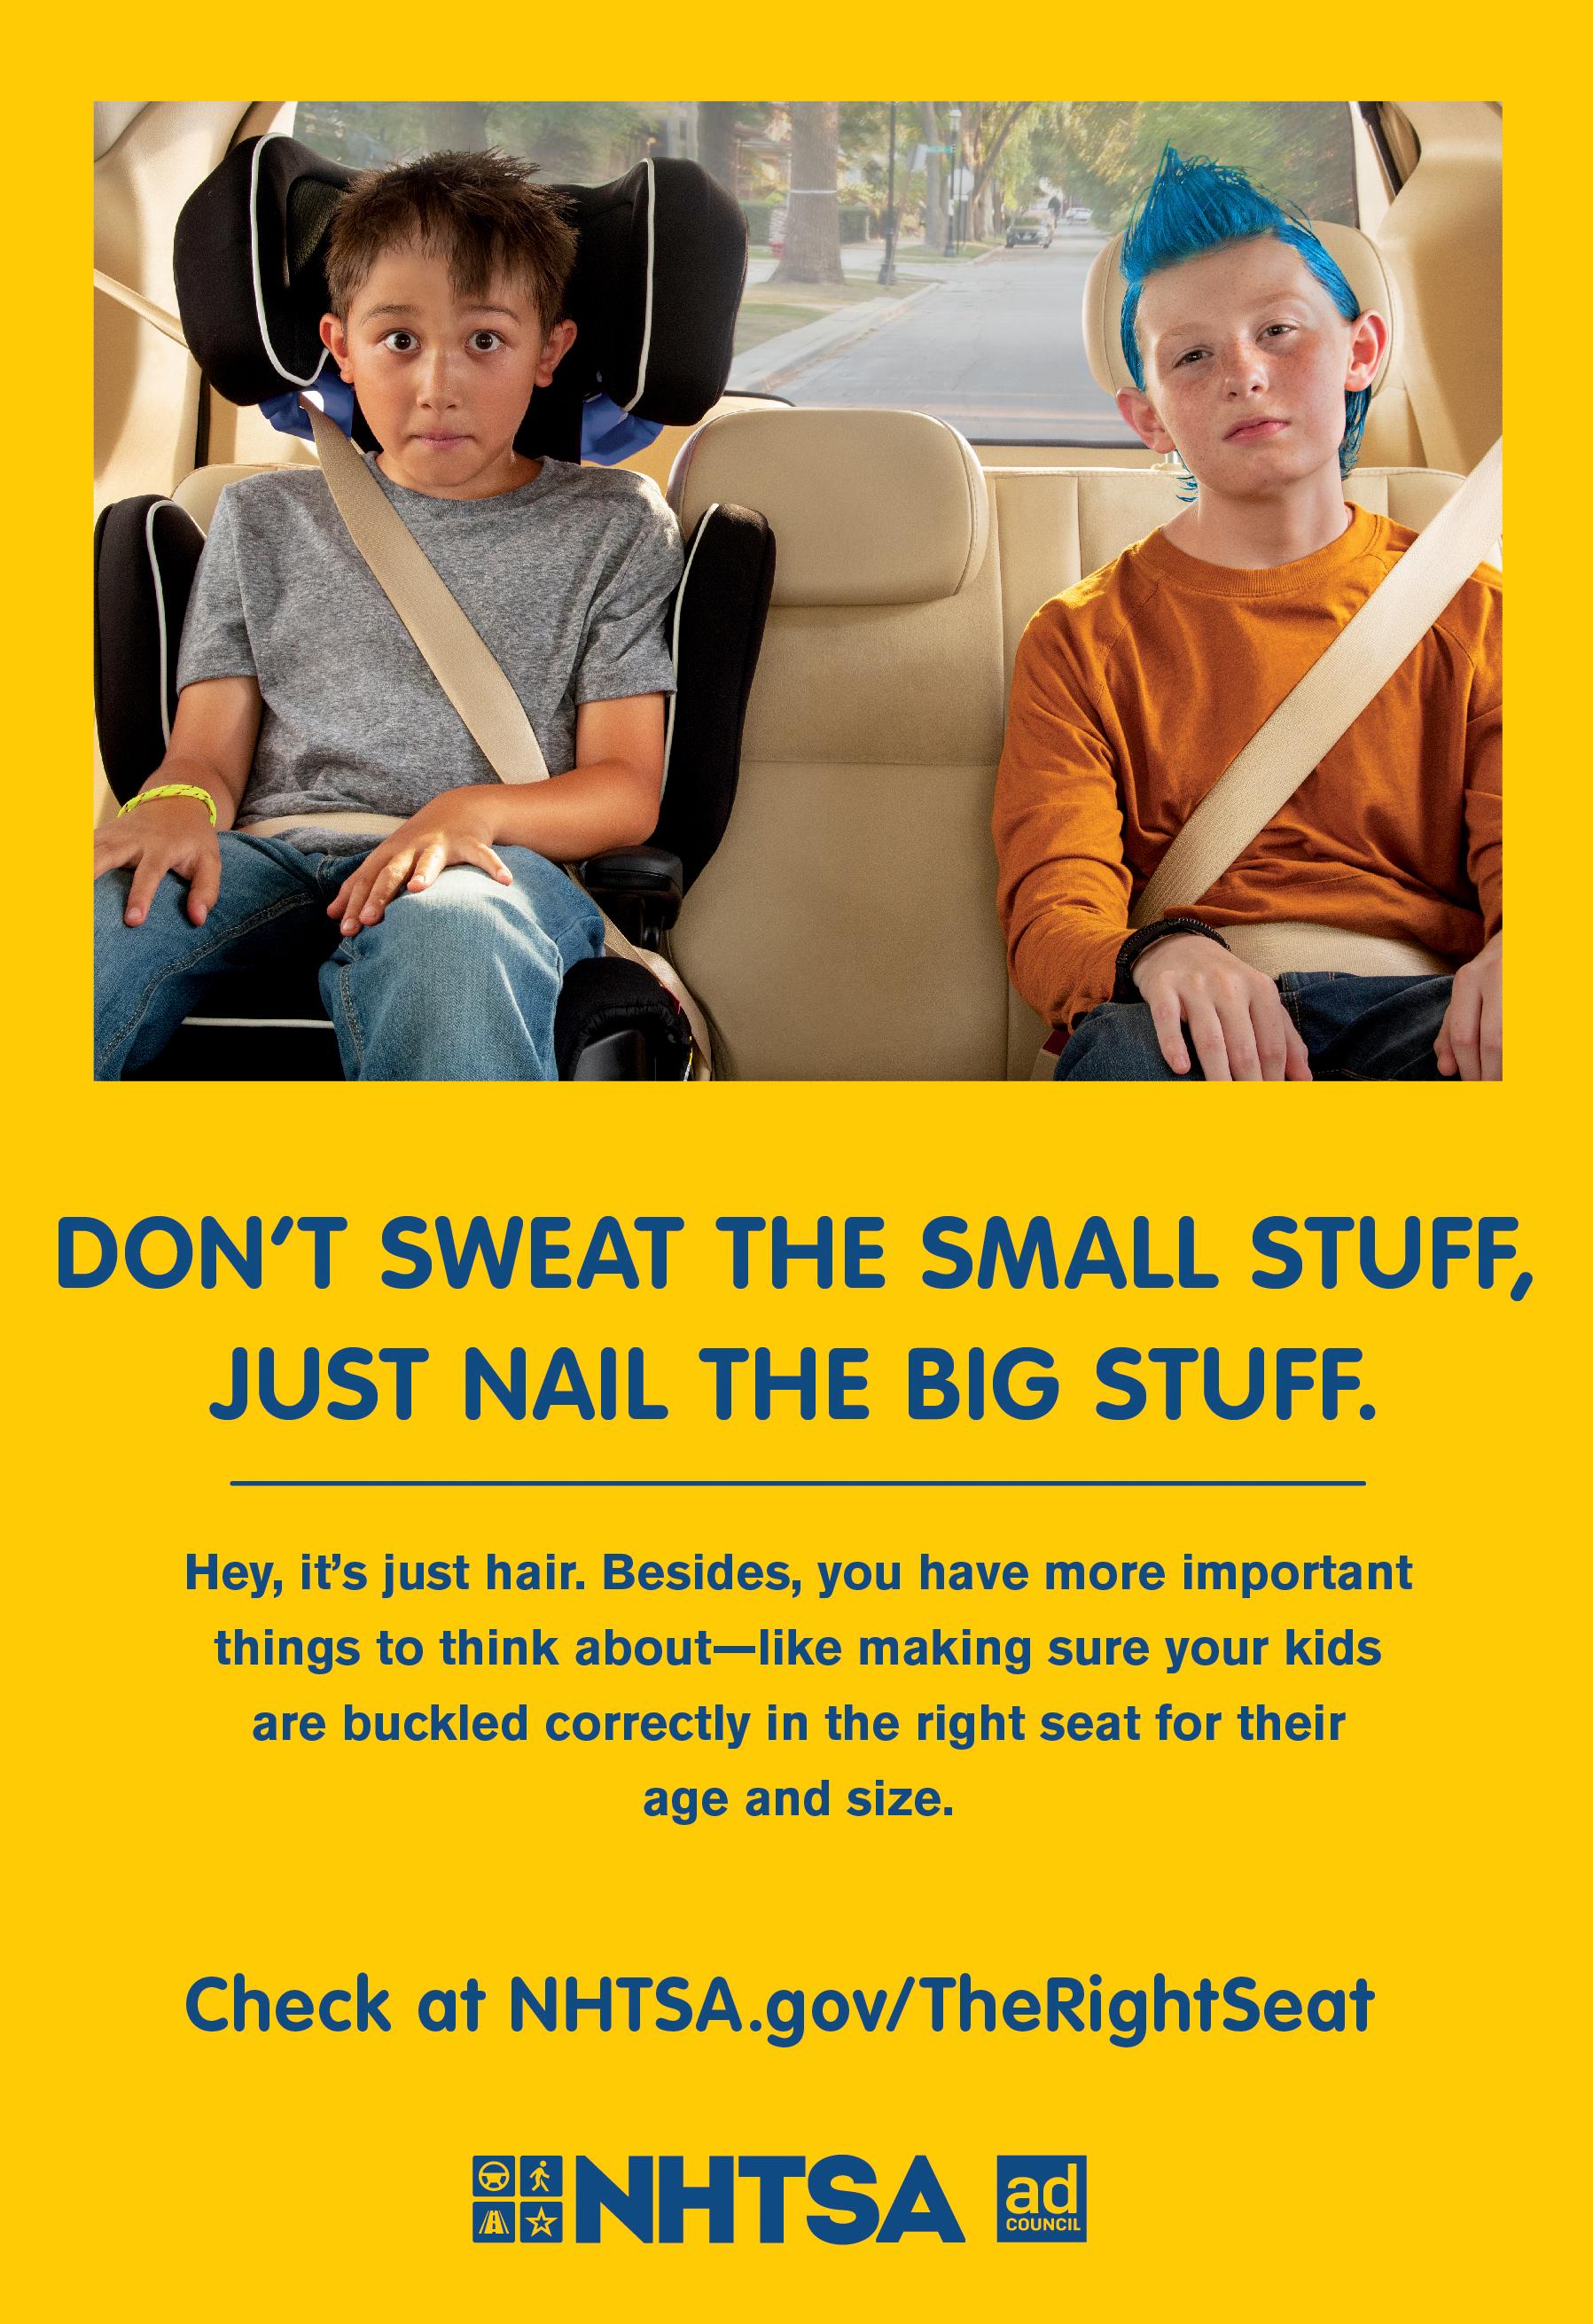 Homemade Hairdos – Bus shelter